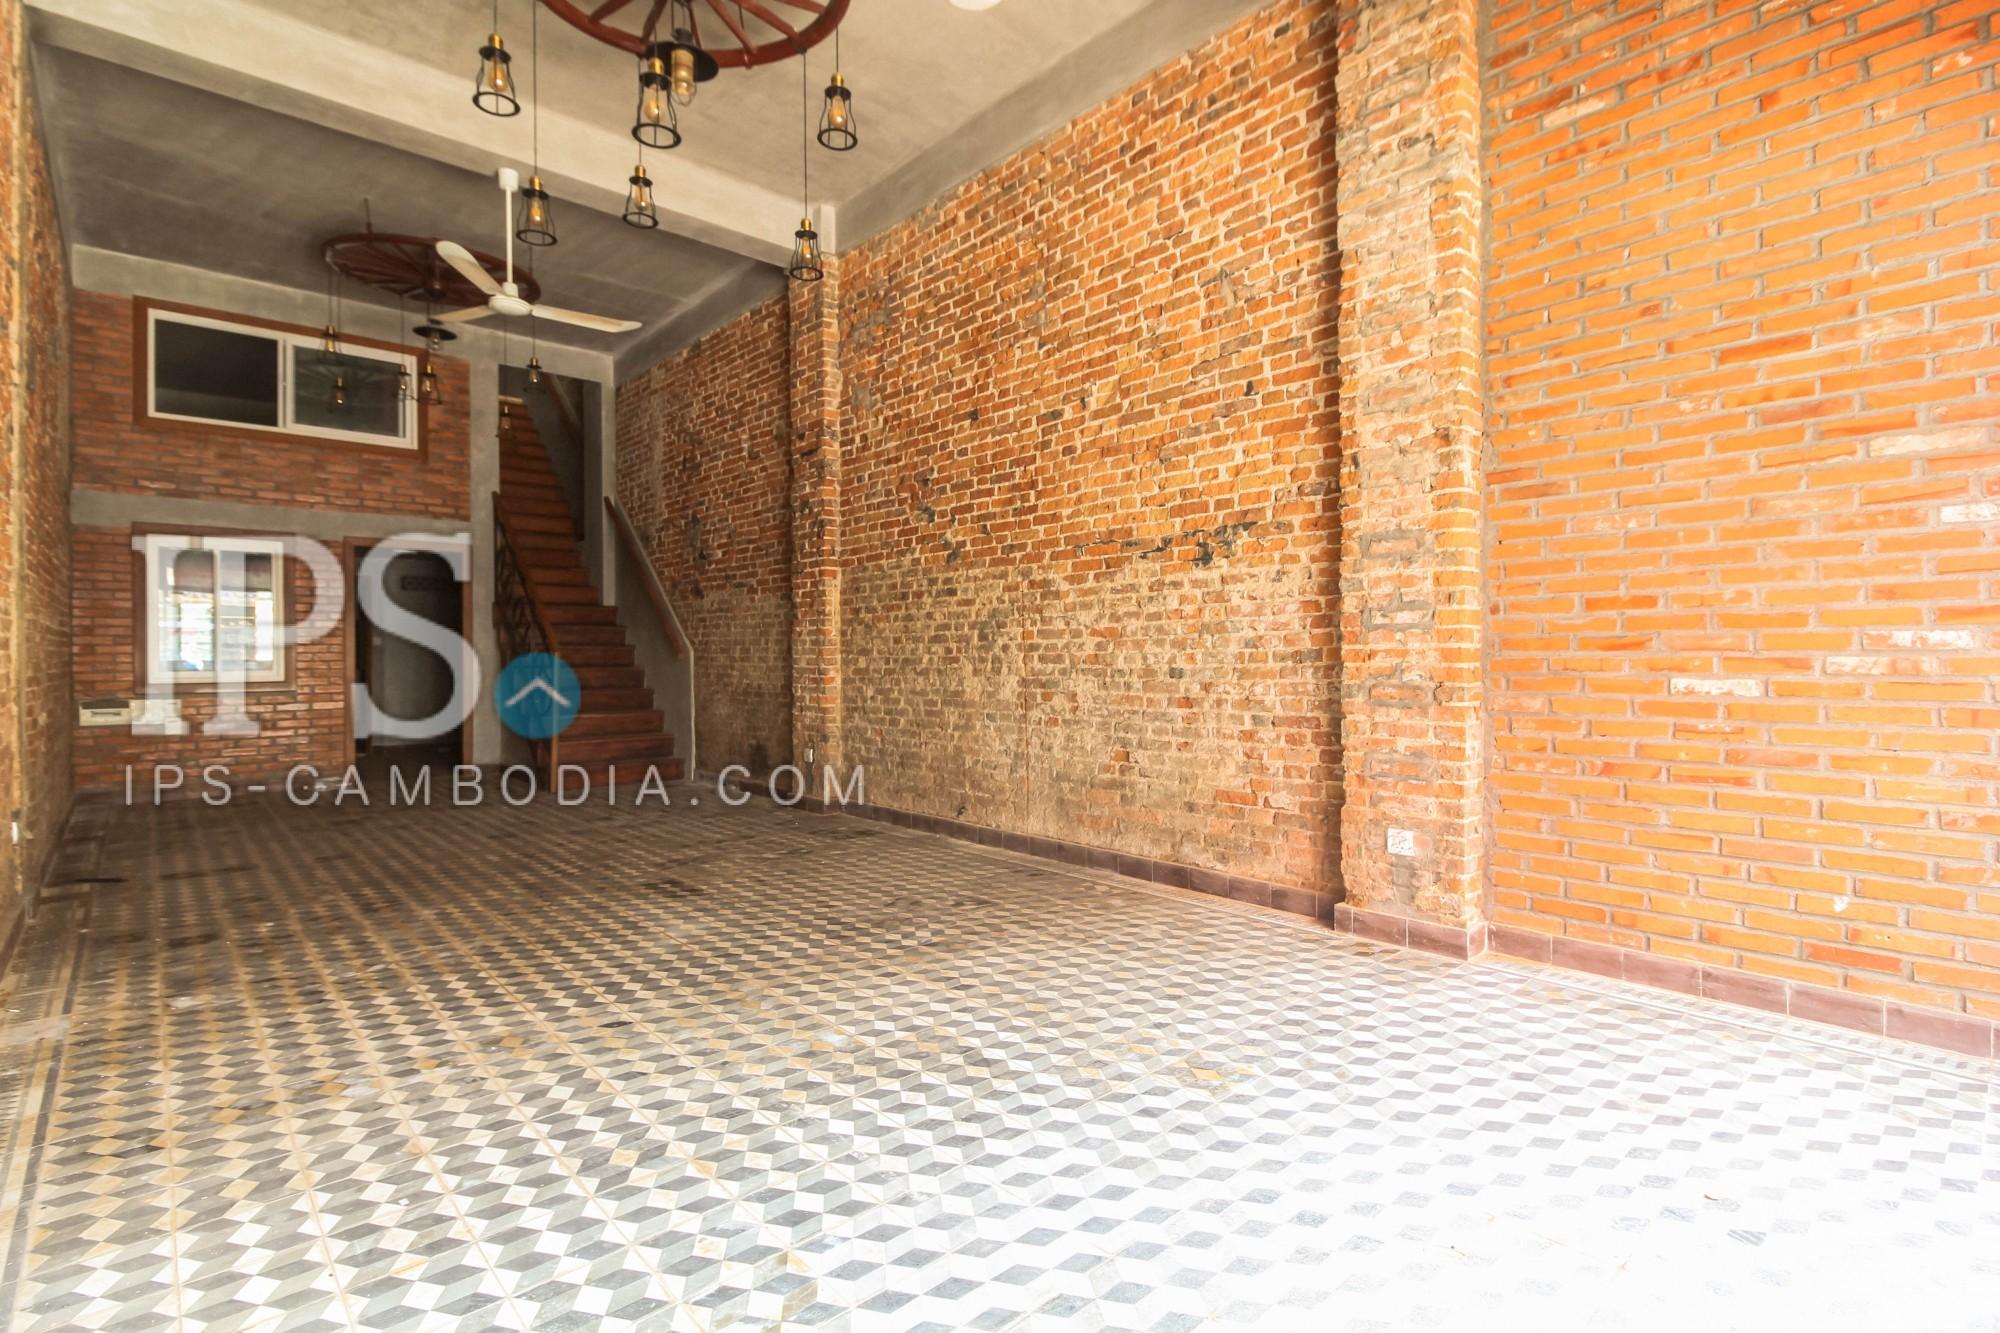 Retail Space For Rent - Old Market / Pub Street, Siem Reap